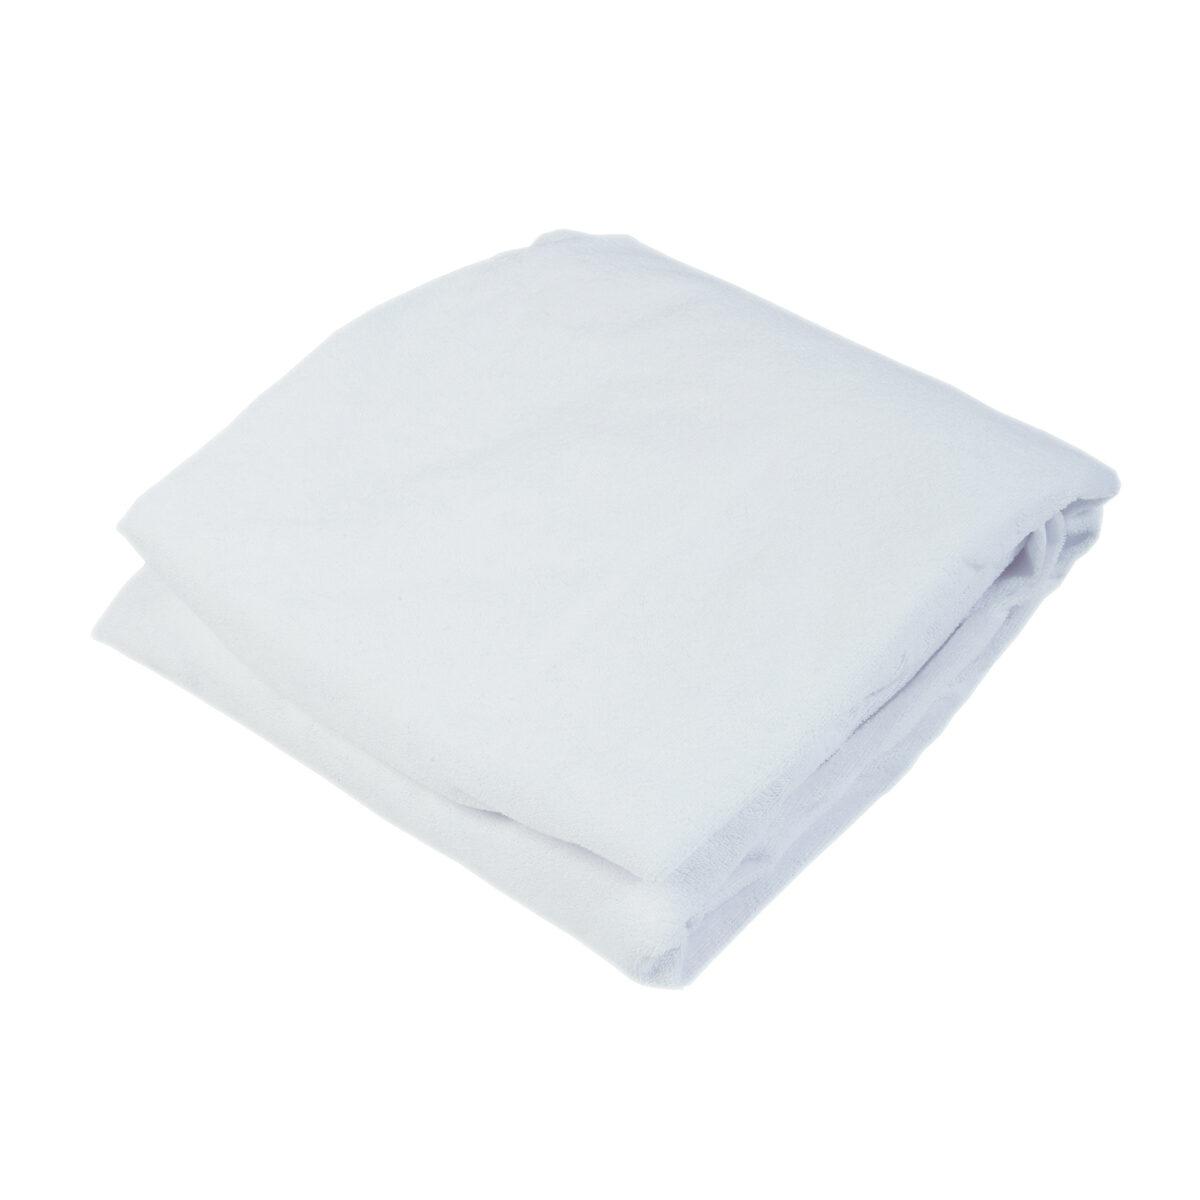 Waterproof Mattress Protectors - White 1